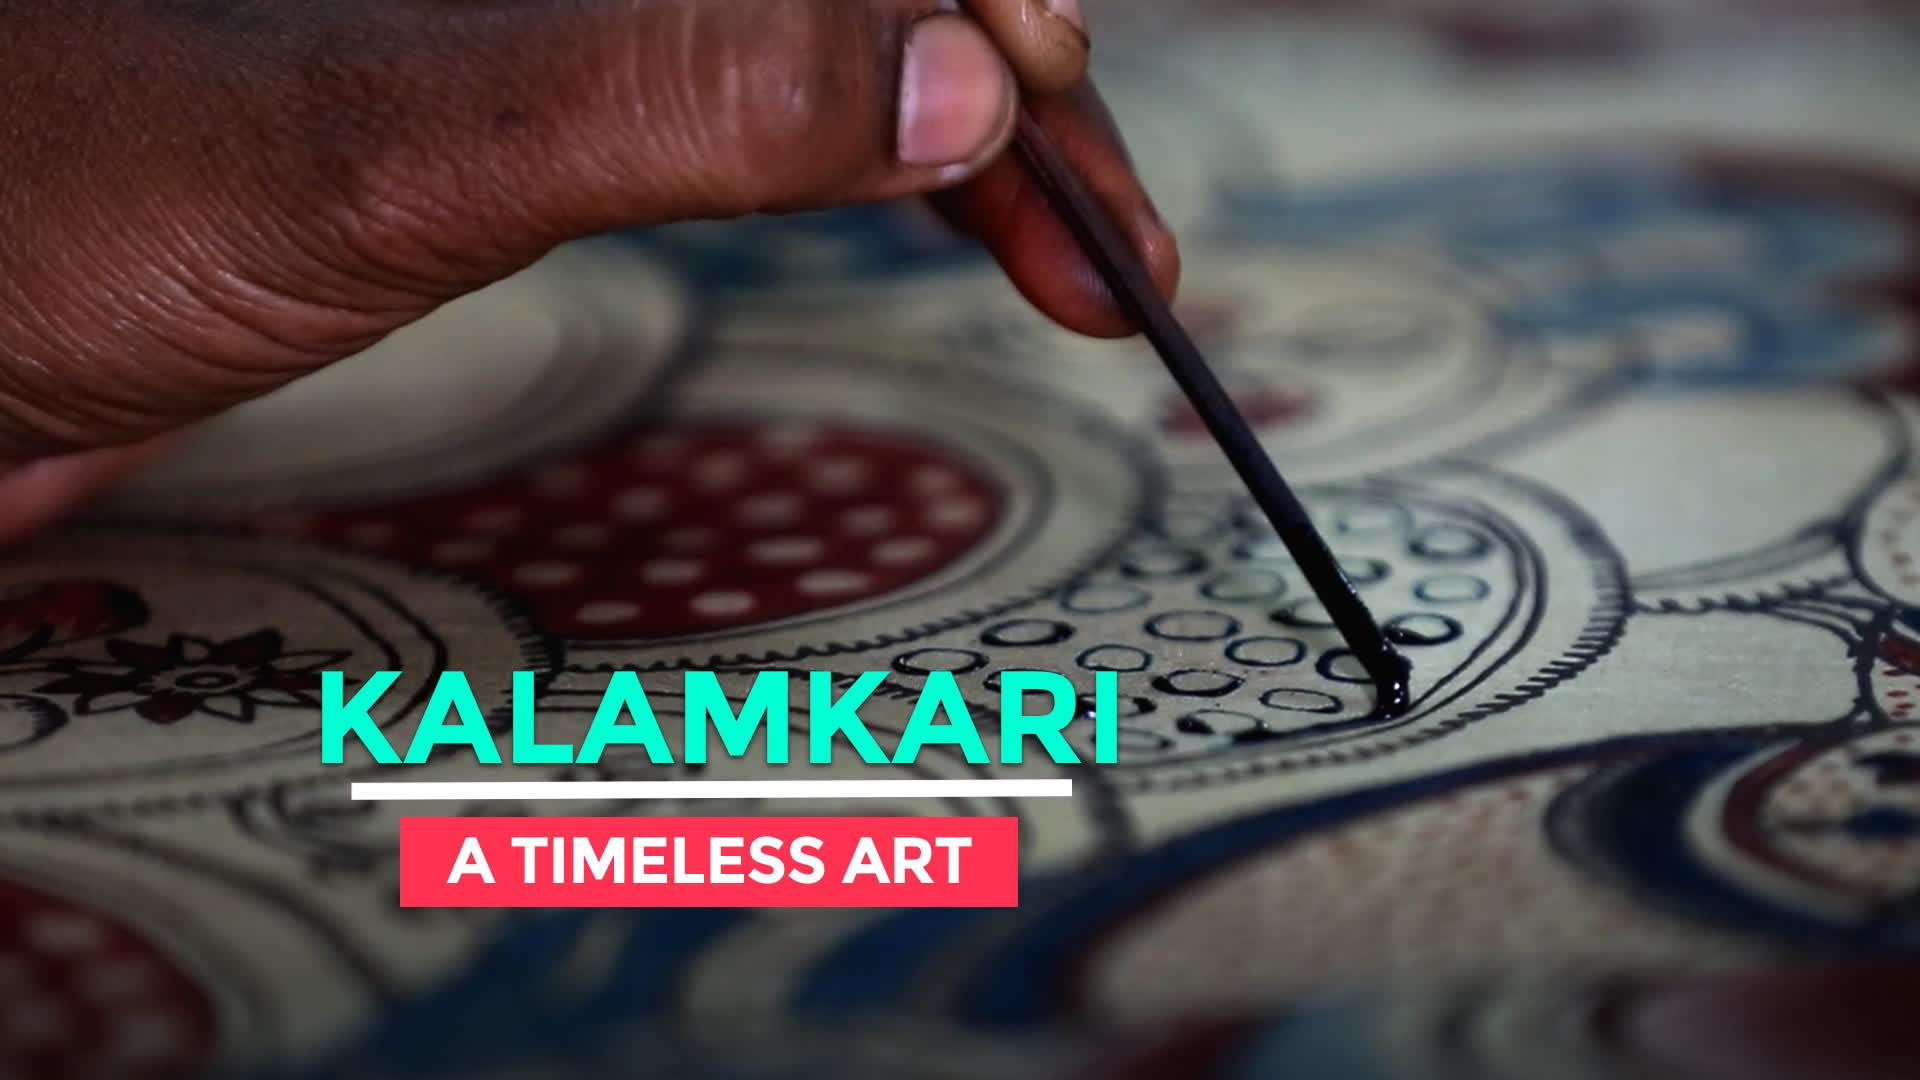 Kalamkari: A Timeless Art